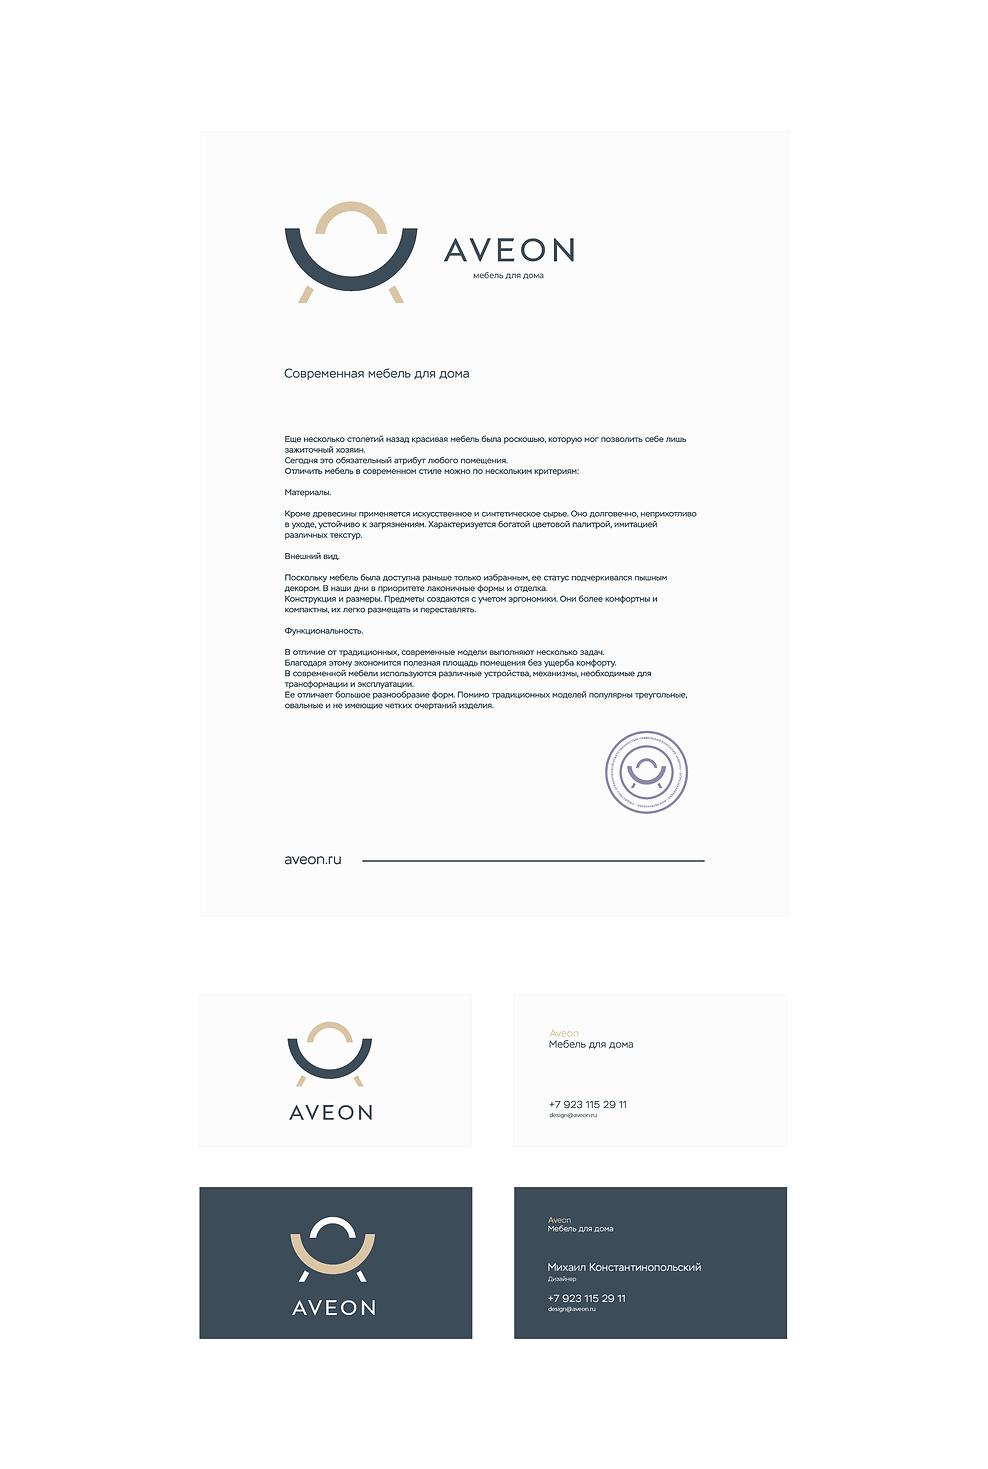 Aveon_Identity 05.png